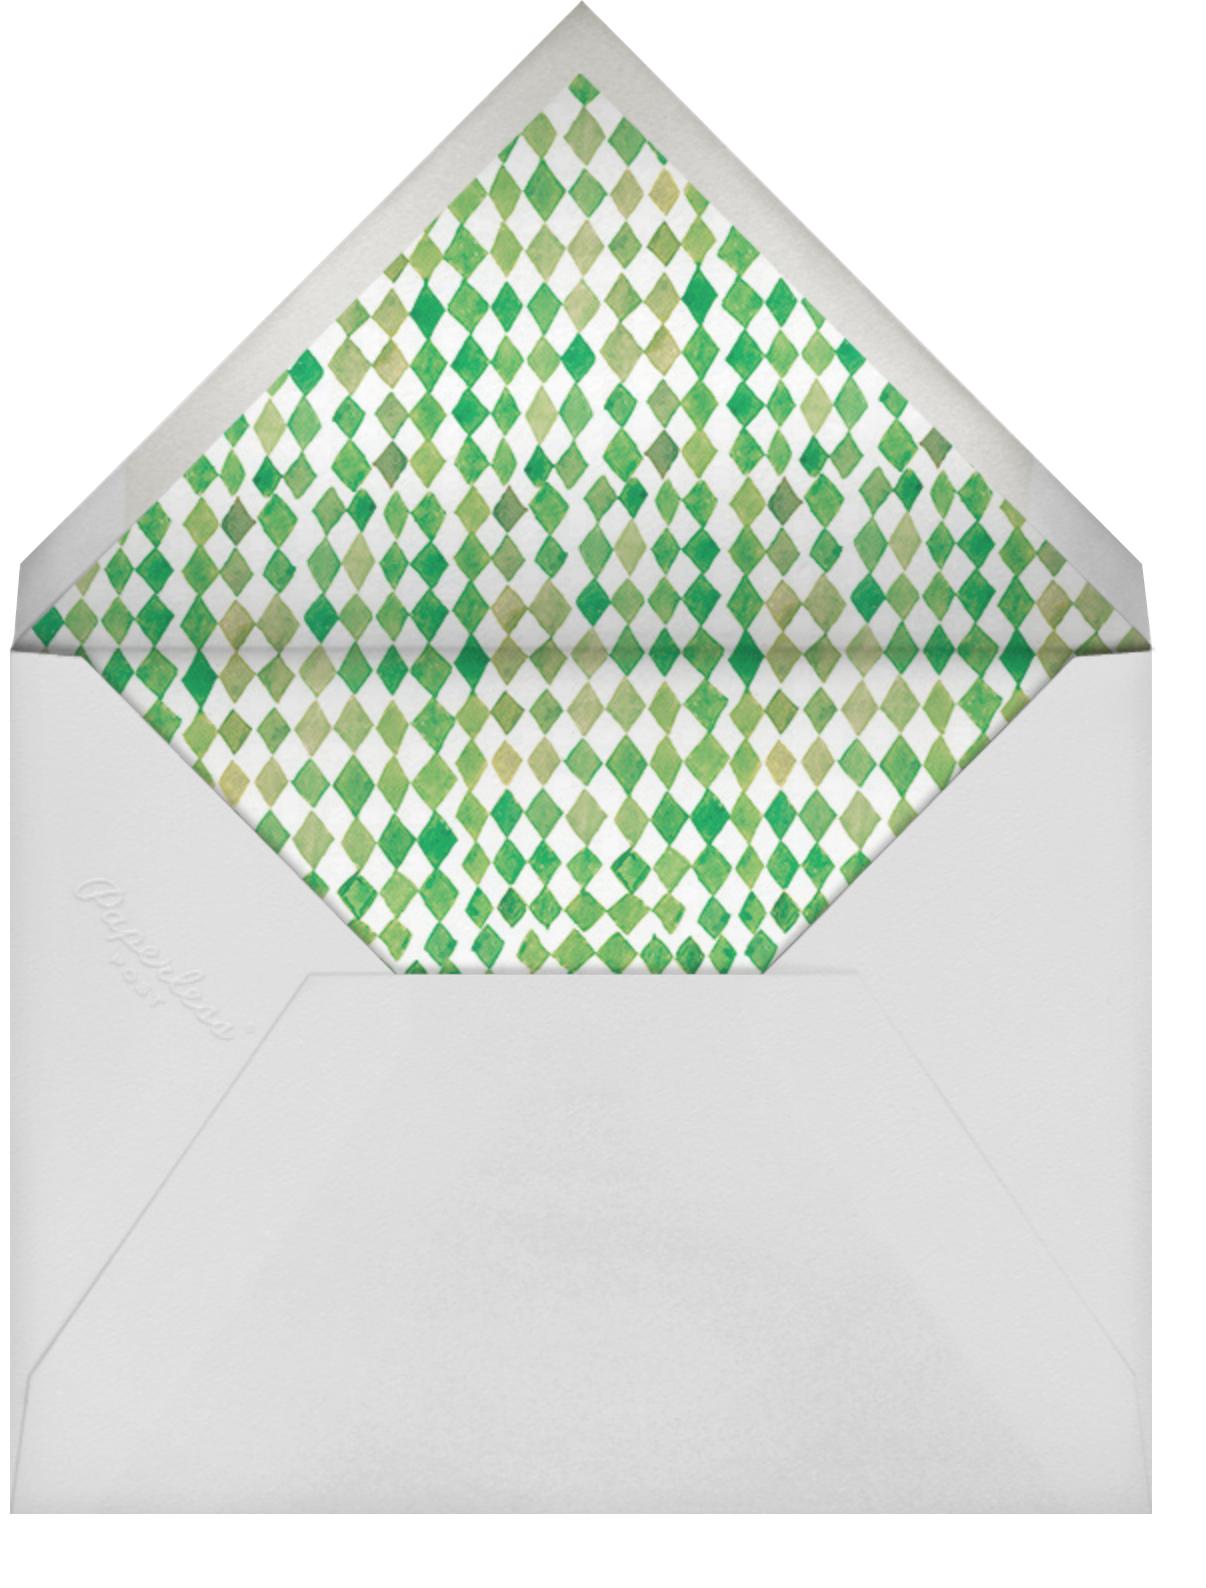 Fancy Pansies - Happy Menocal - Bridal shower - envelope back